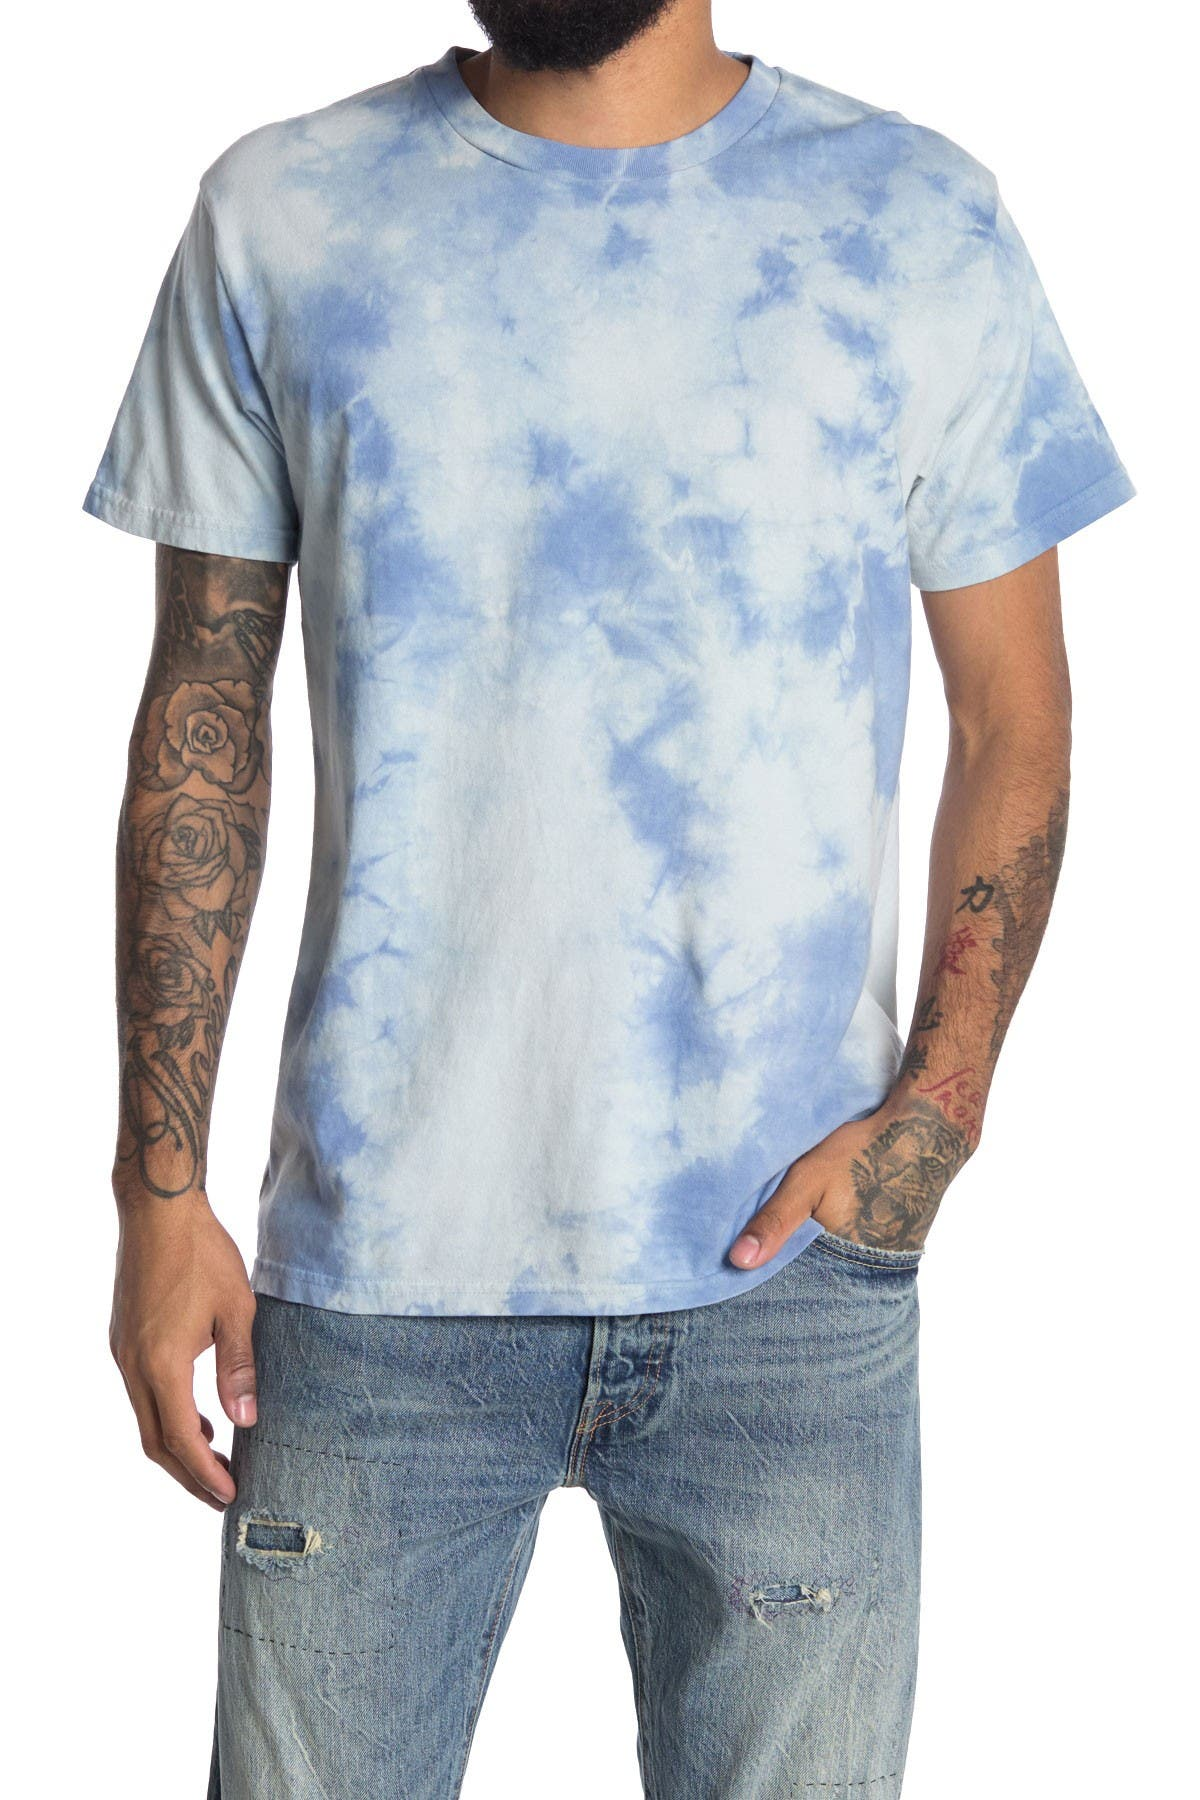 Image of Original Paperbacks Tie Dye Crew Neck T-Shirt